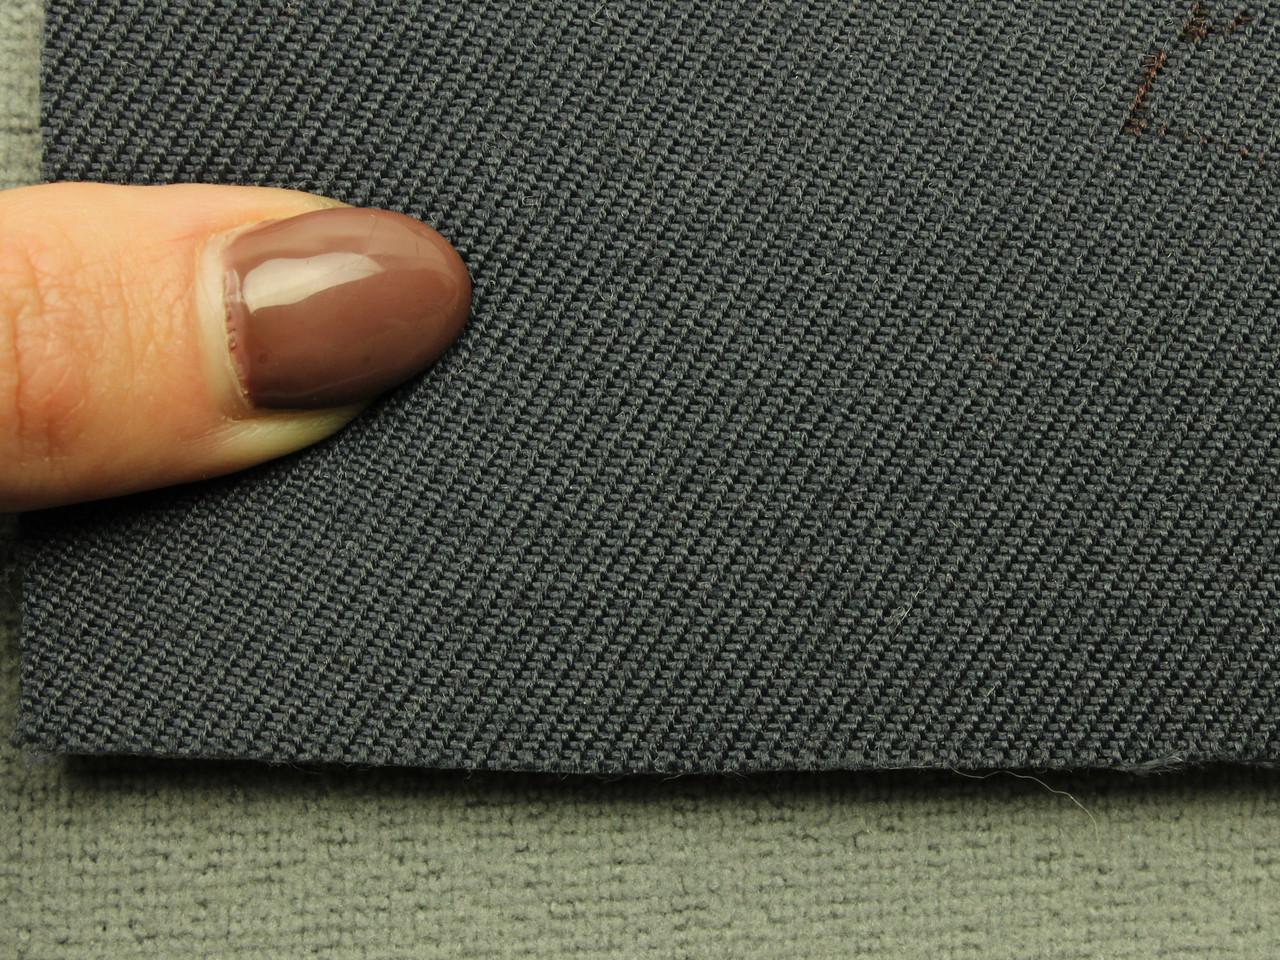 Ткань для сидений автомобиля, цвет темно синий, на поролоне (для боковой части) Германия